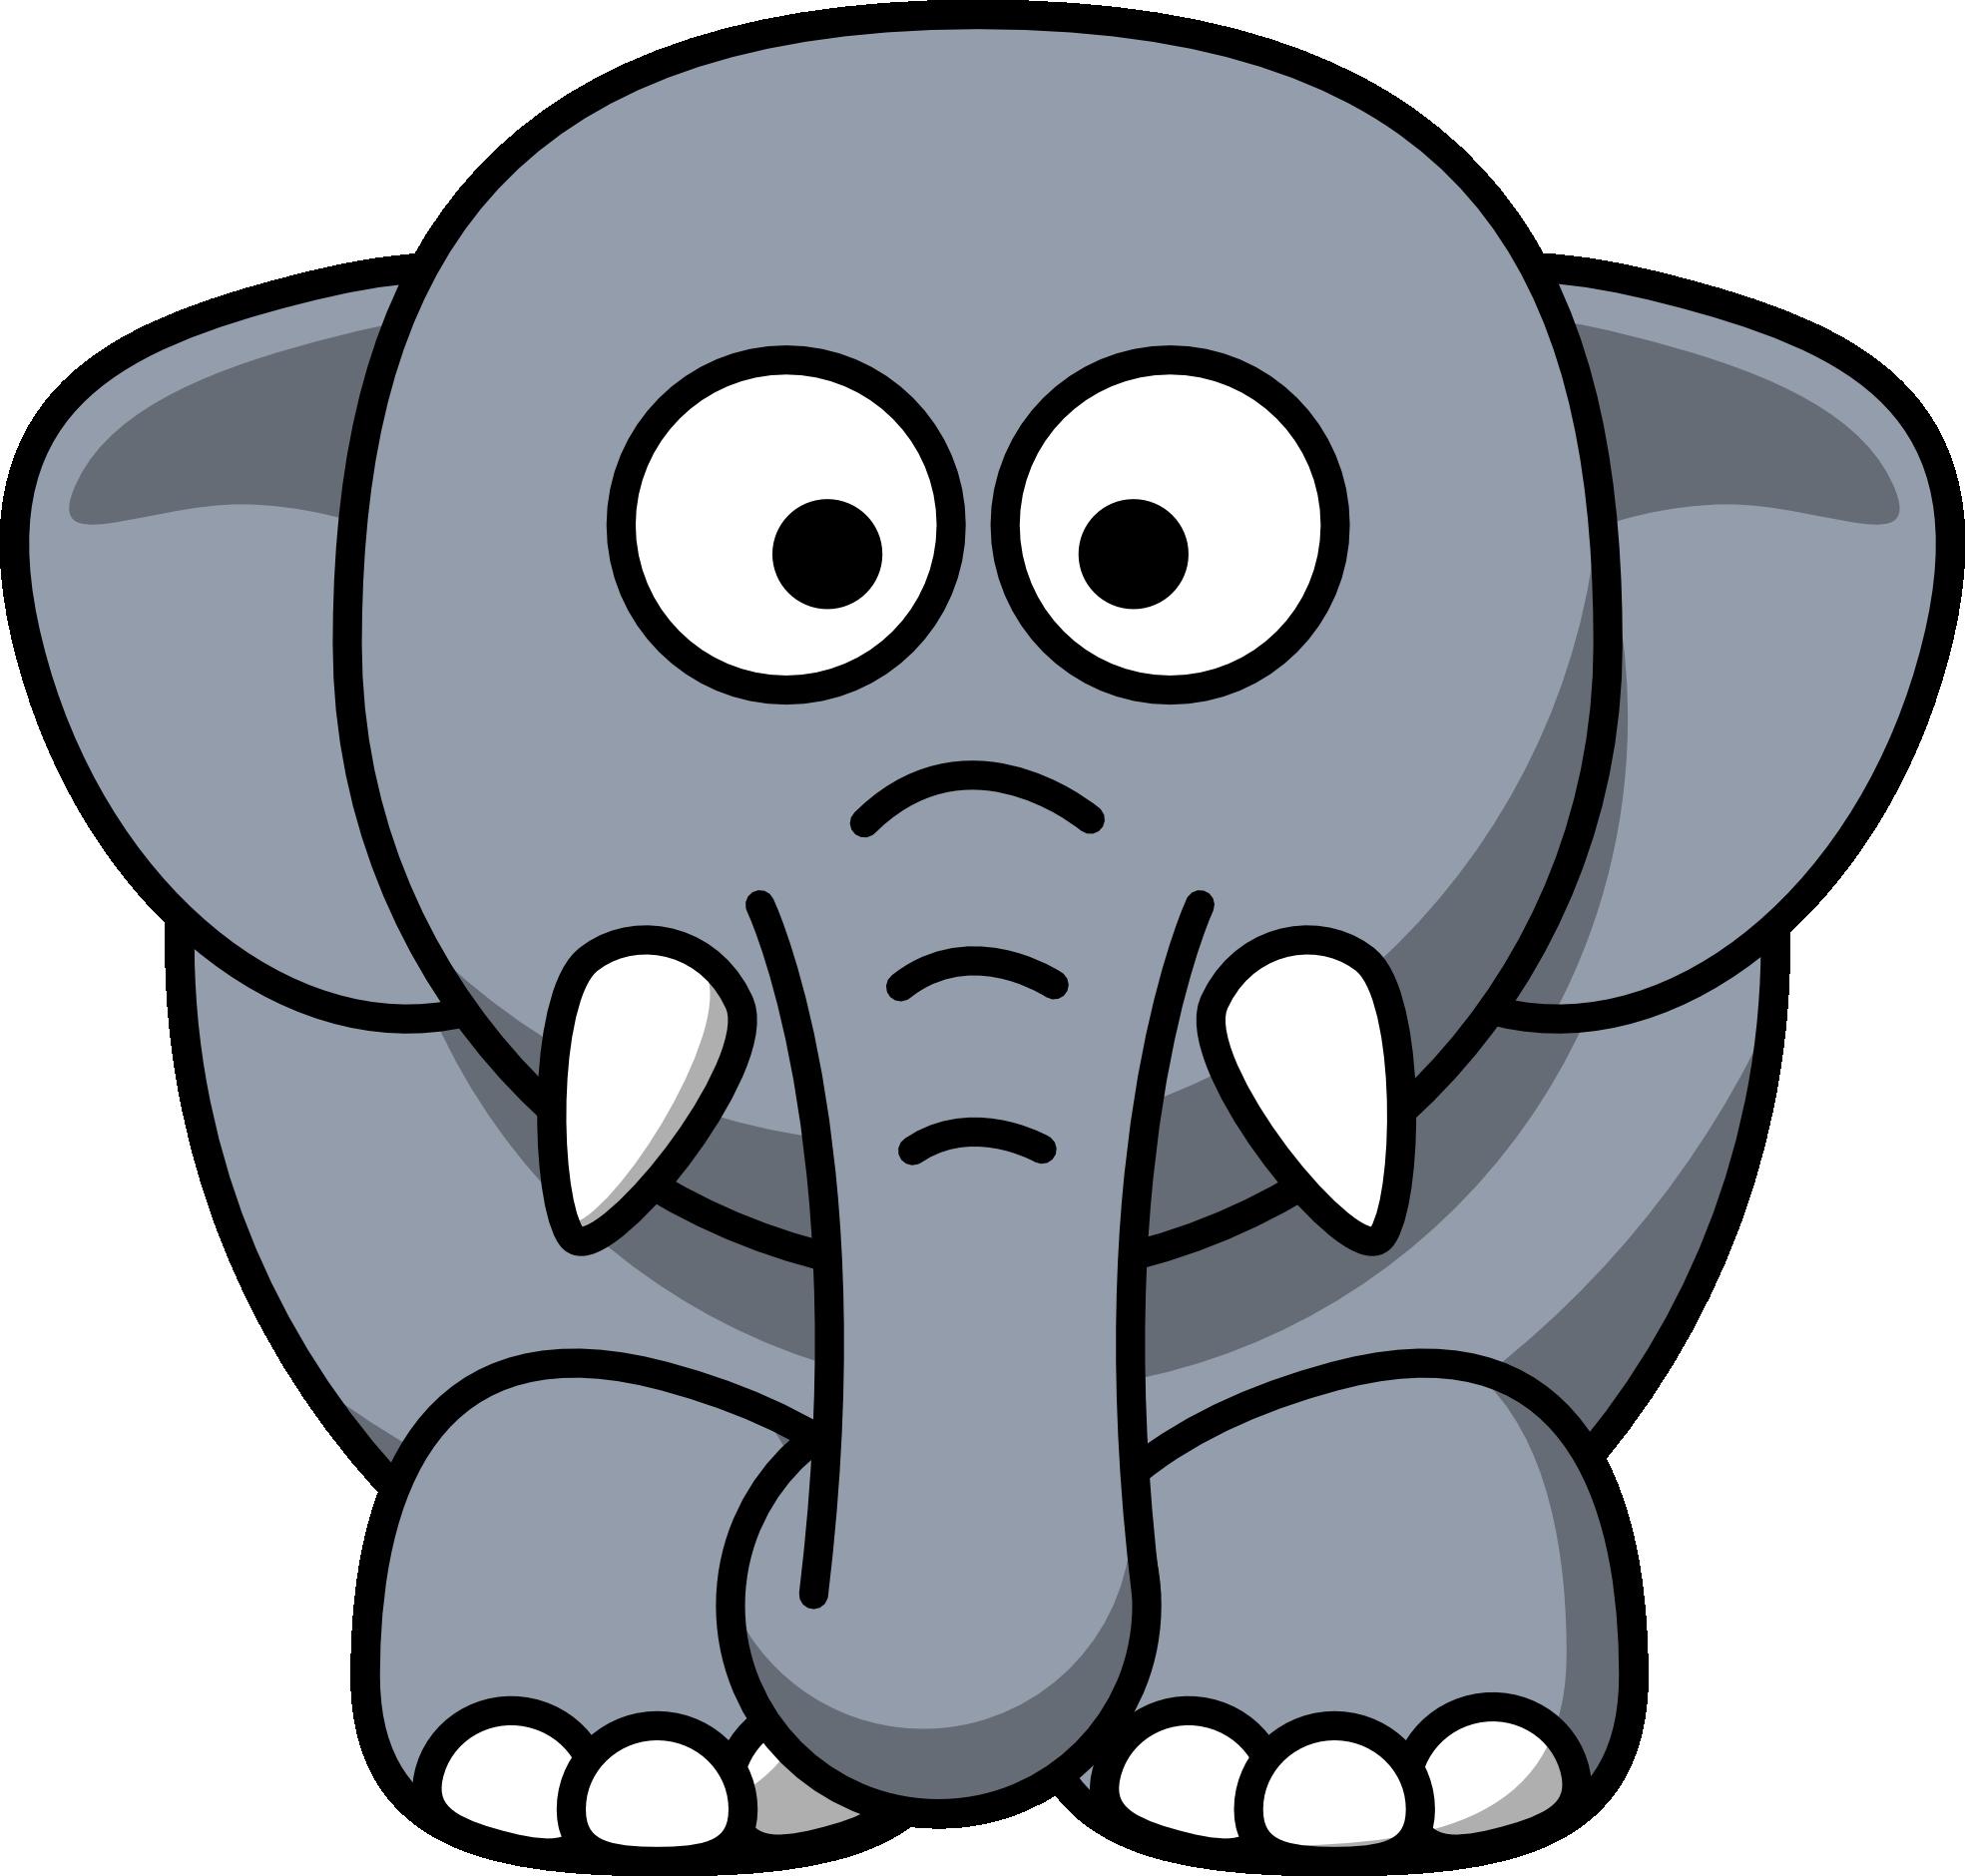 king elephant fun icebreaker birthday themes zoo animals rh pinterest com Funny Elephant Clip Art cute elephant face clipart